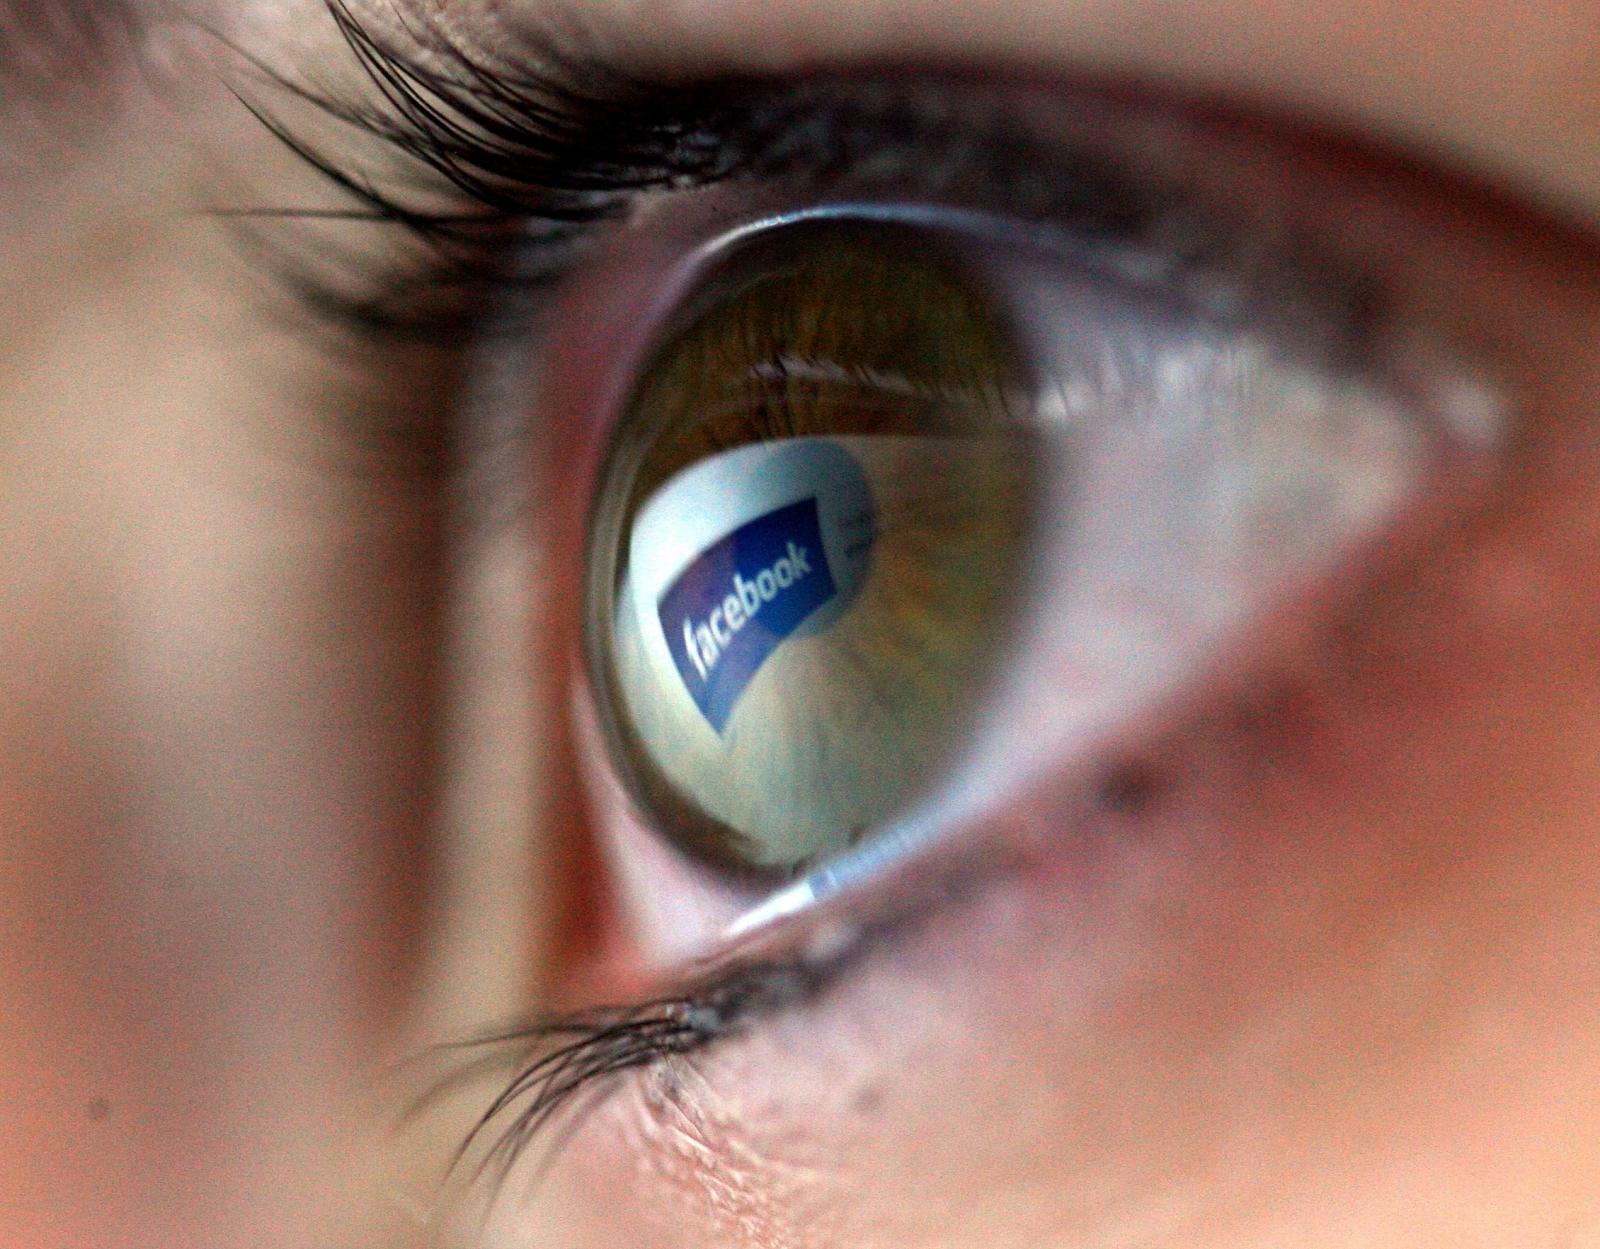 Facebook failed to meet rape abuse standards